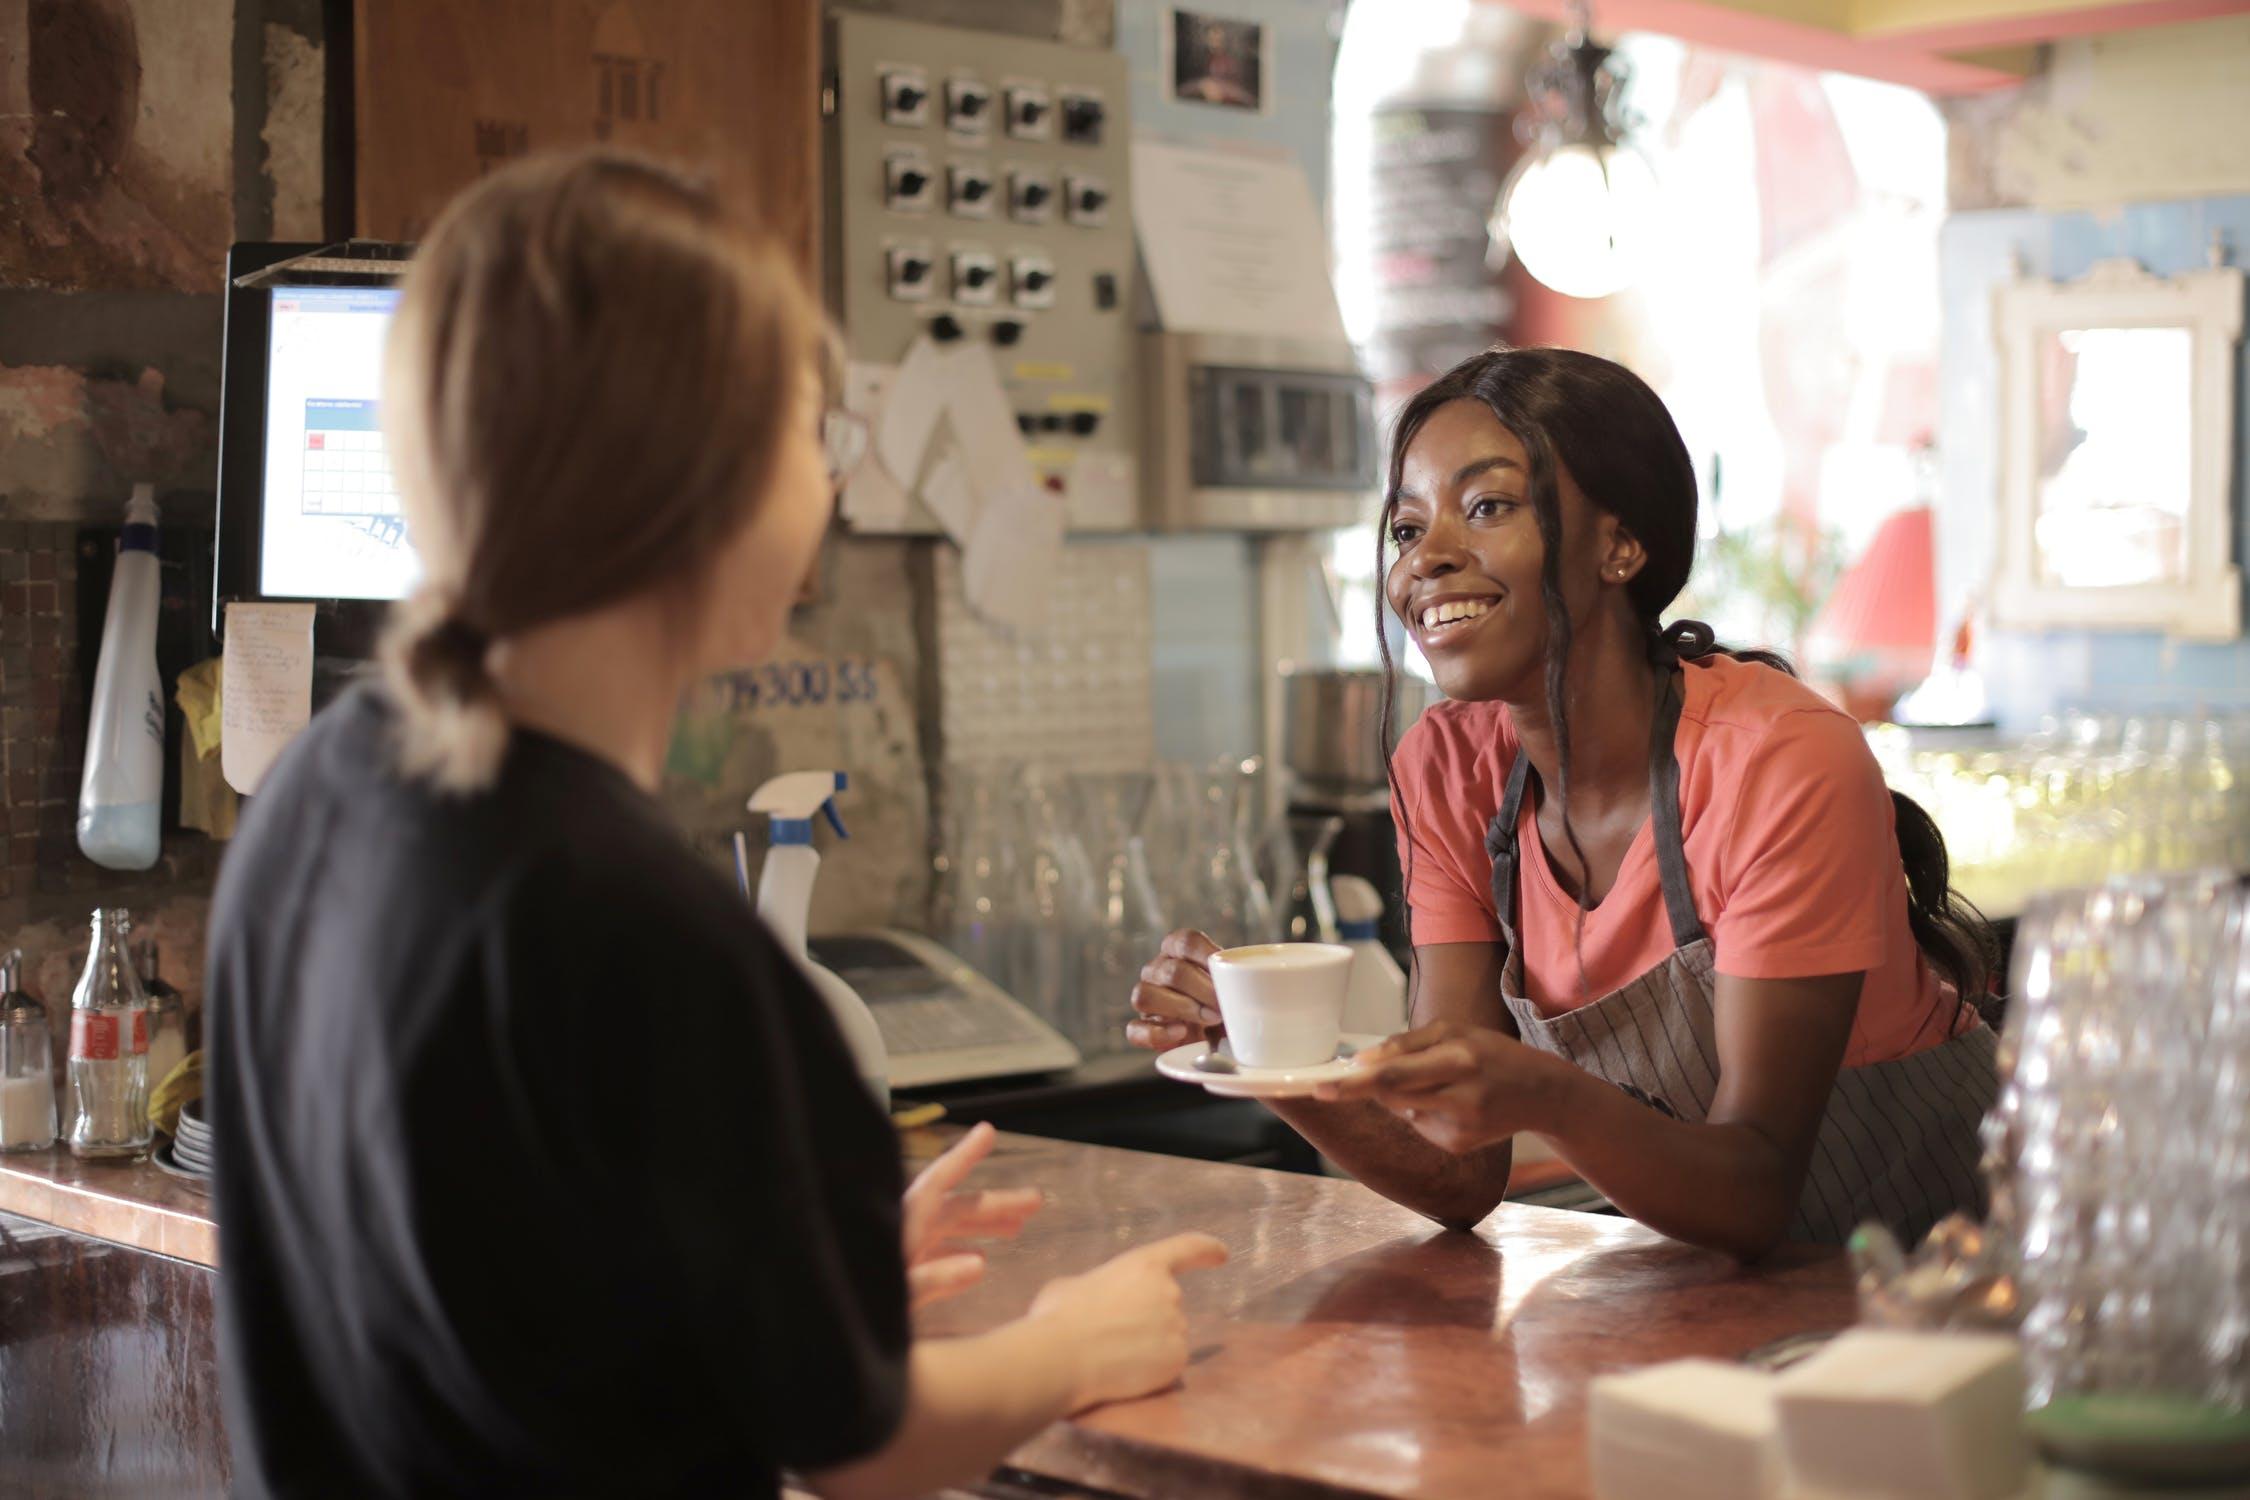 Black woman serving at coffee shop